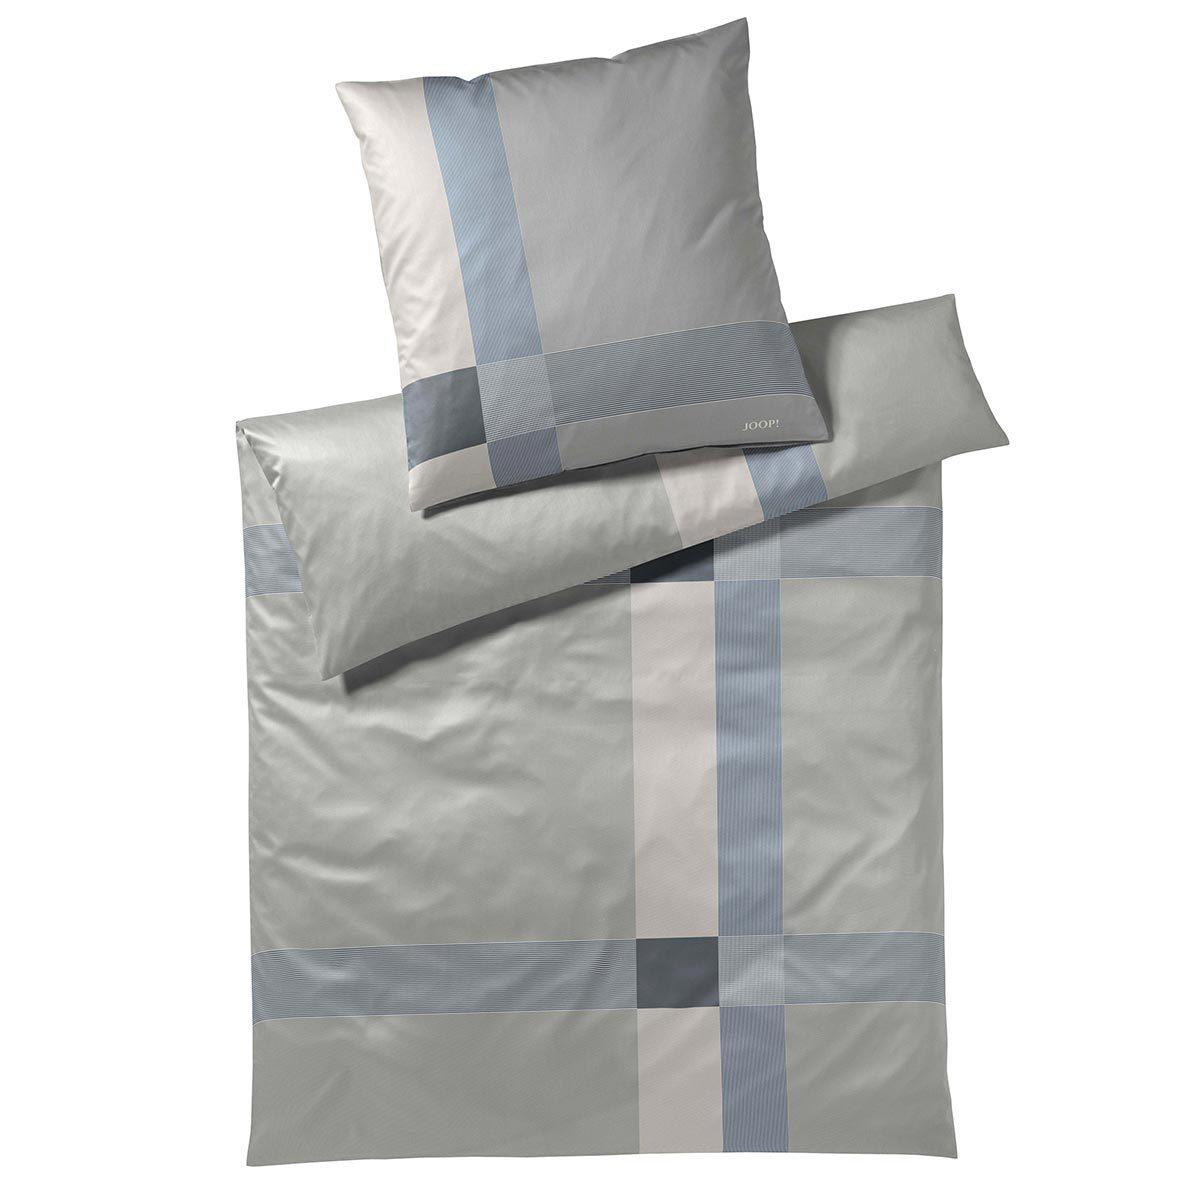 joop bettw sche split concrete g nstig online kaufen bei. Black Bedroom Furniture Sets. Home Design Ideas